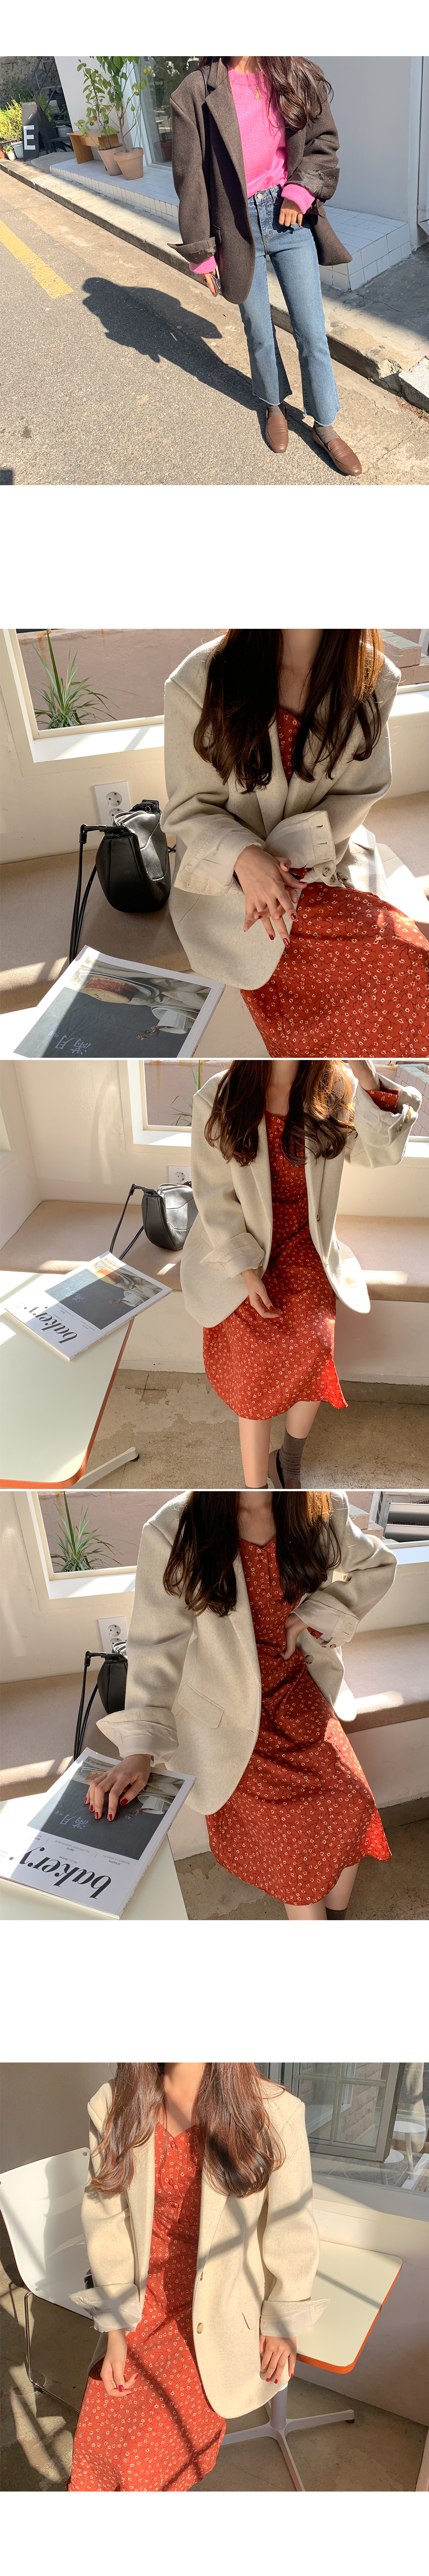 Blanche wool jacket